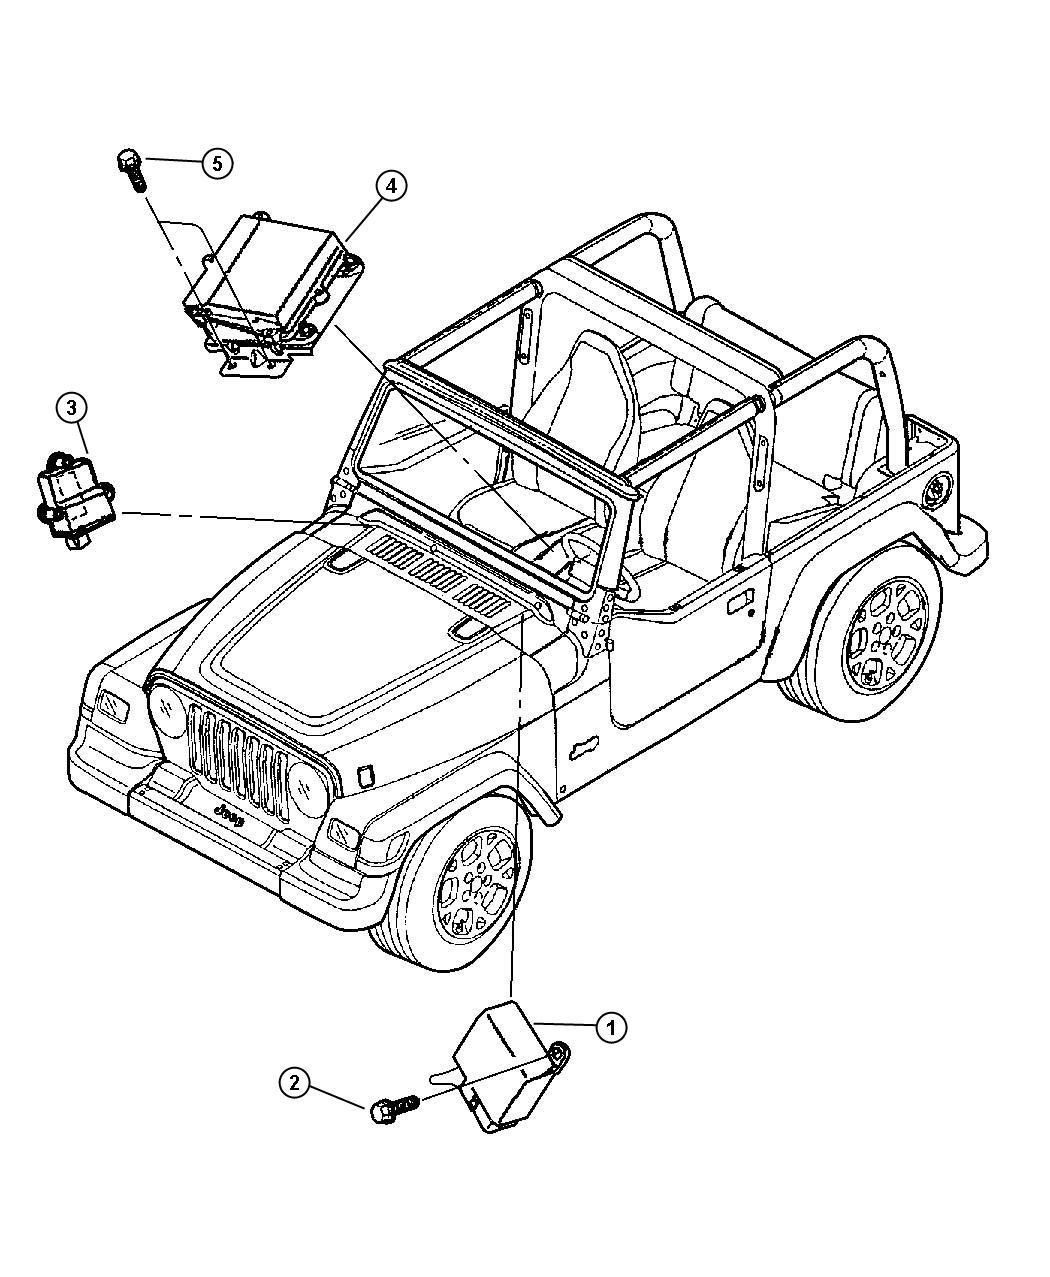 Jeep Wrangler Module. Daytime running lamp